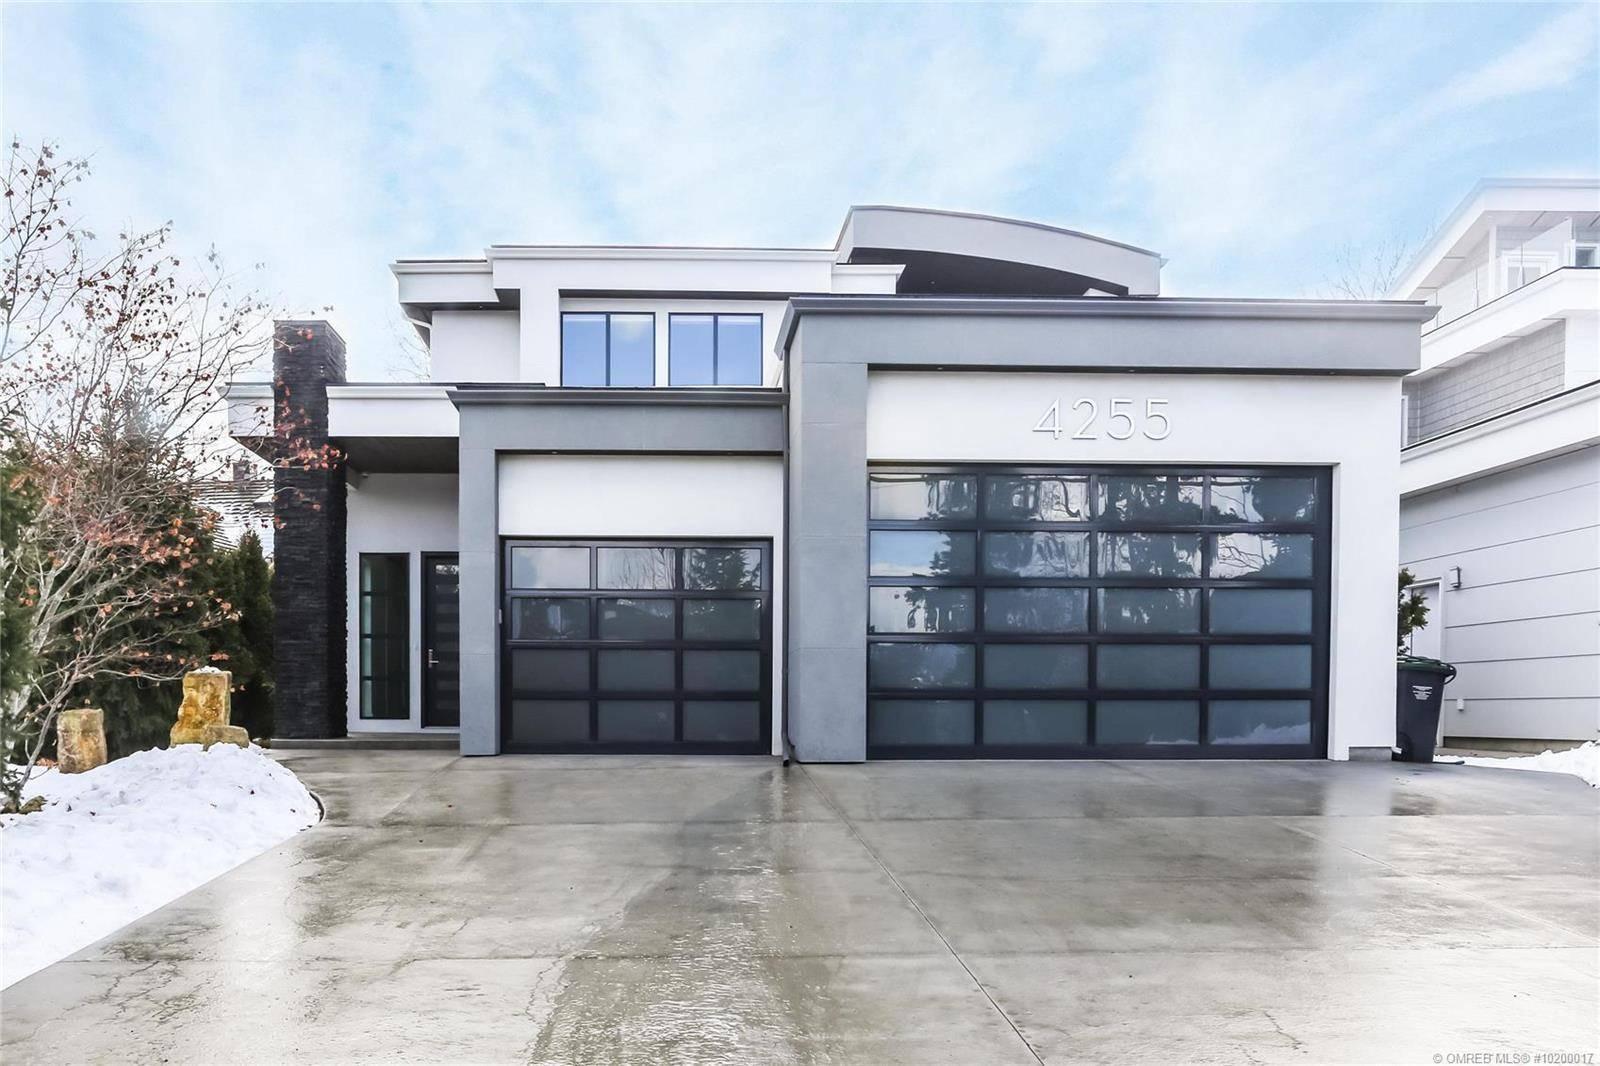 House for sale at 4255 Hobson Rd Kelowna British Columbia - MLS: 10200017